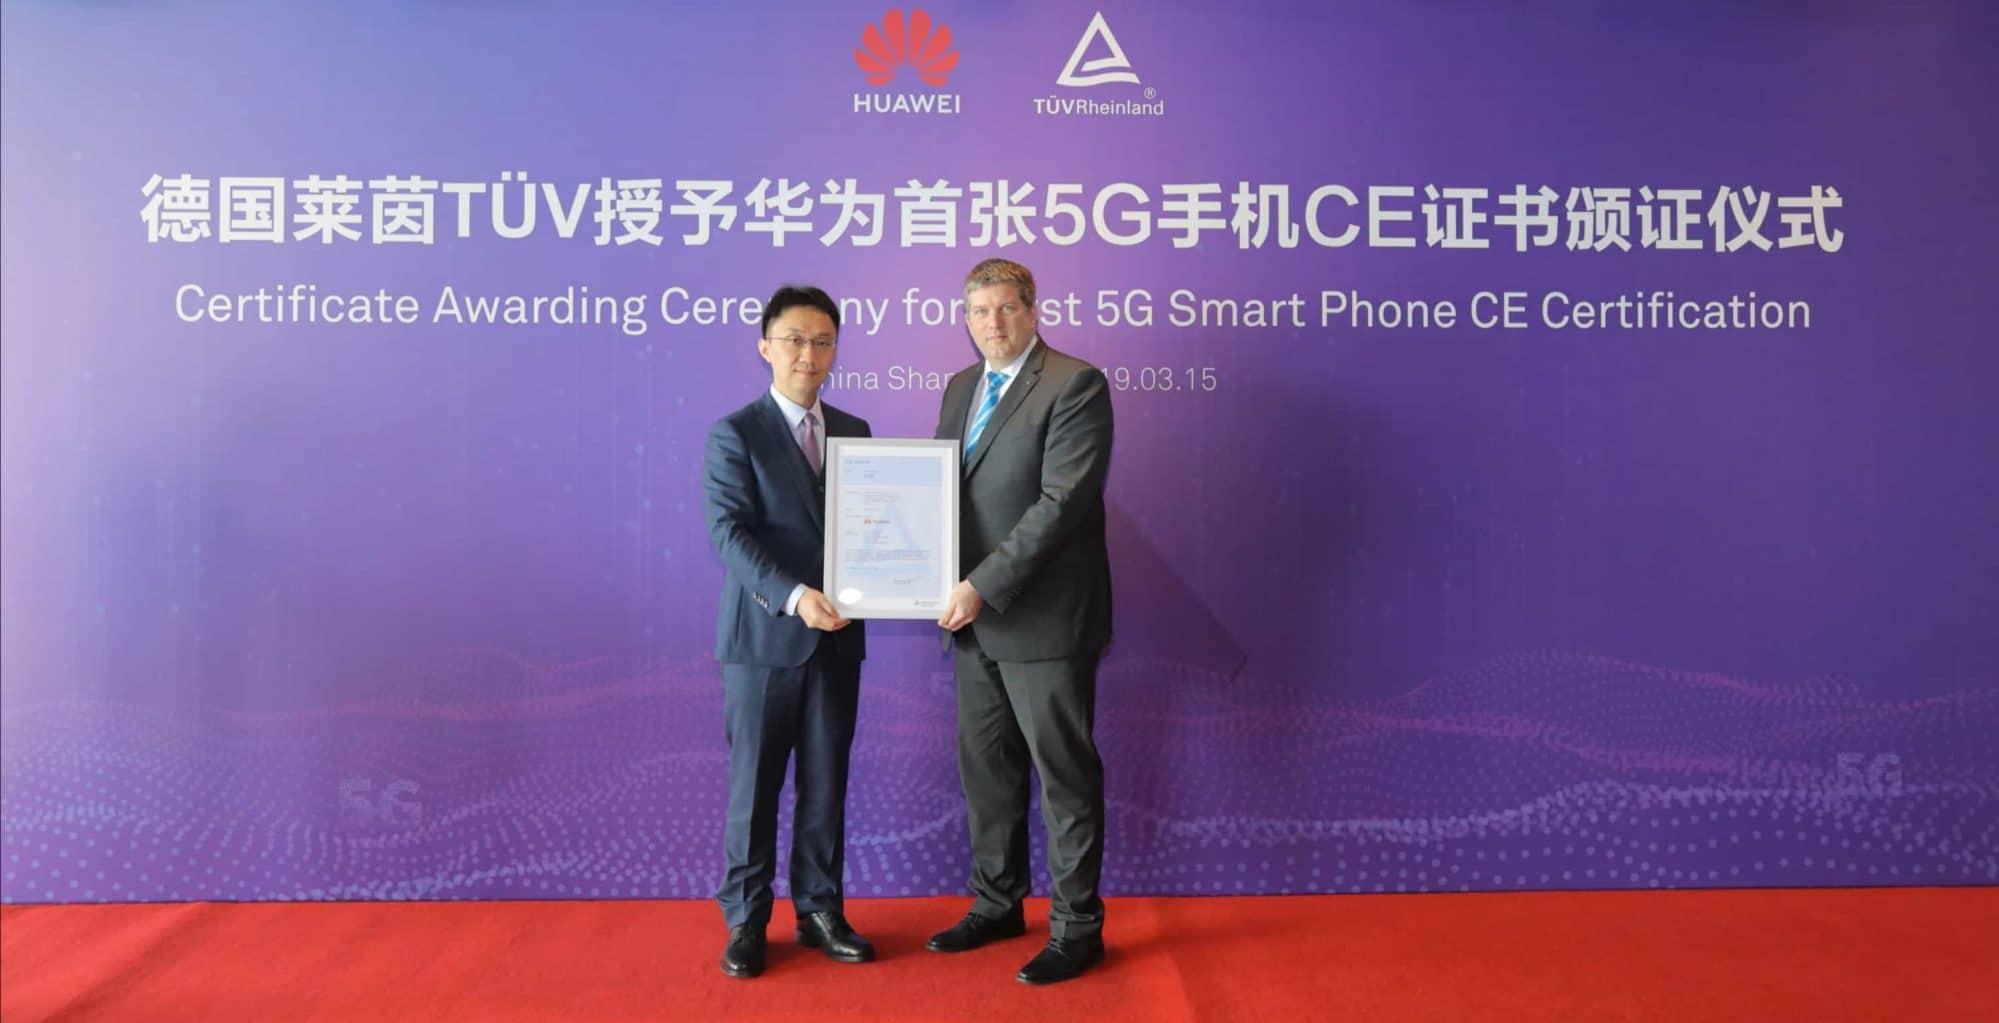 - HUAWEI Mate X คว้าใบรับรองคุณสมบัติ 5G CE ใบแรกของโลกจาก TÜV Rheinland